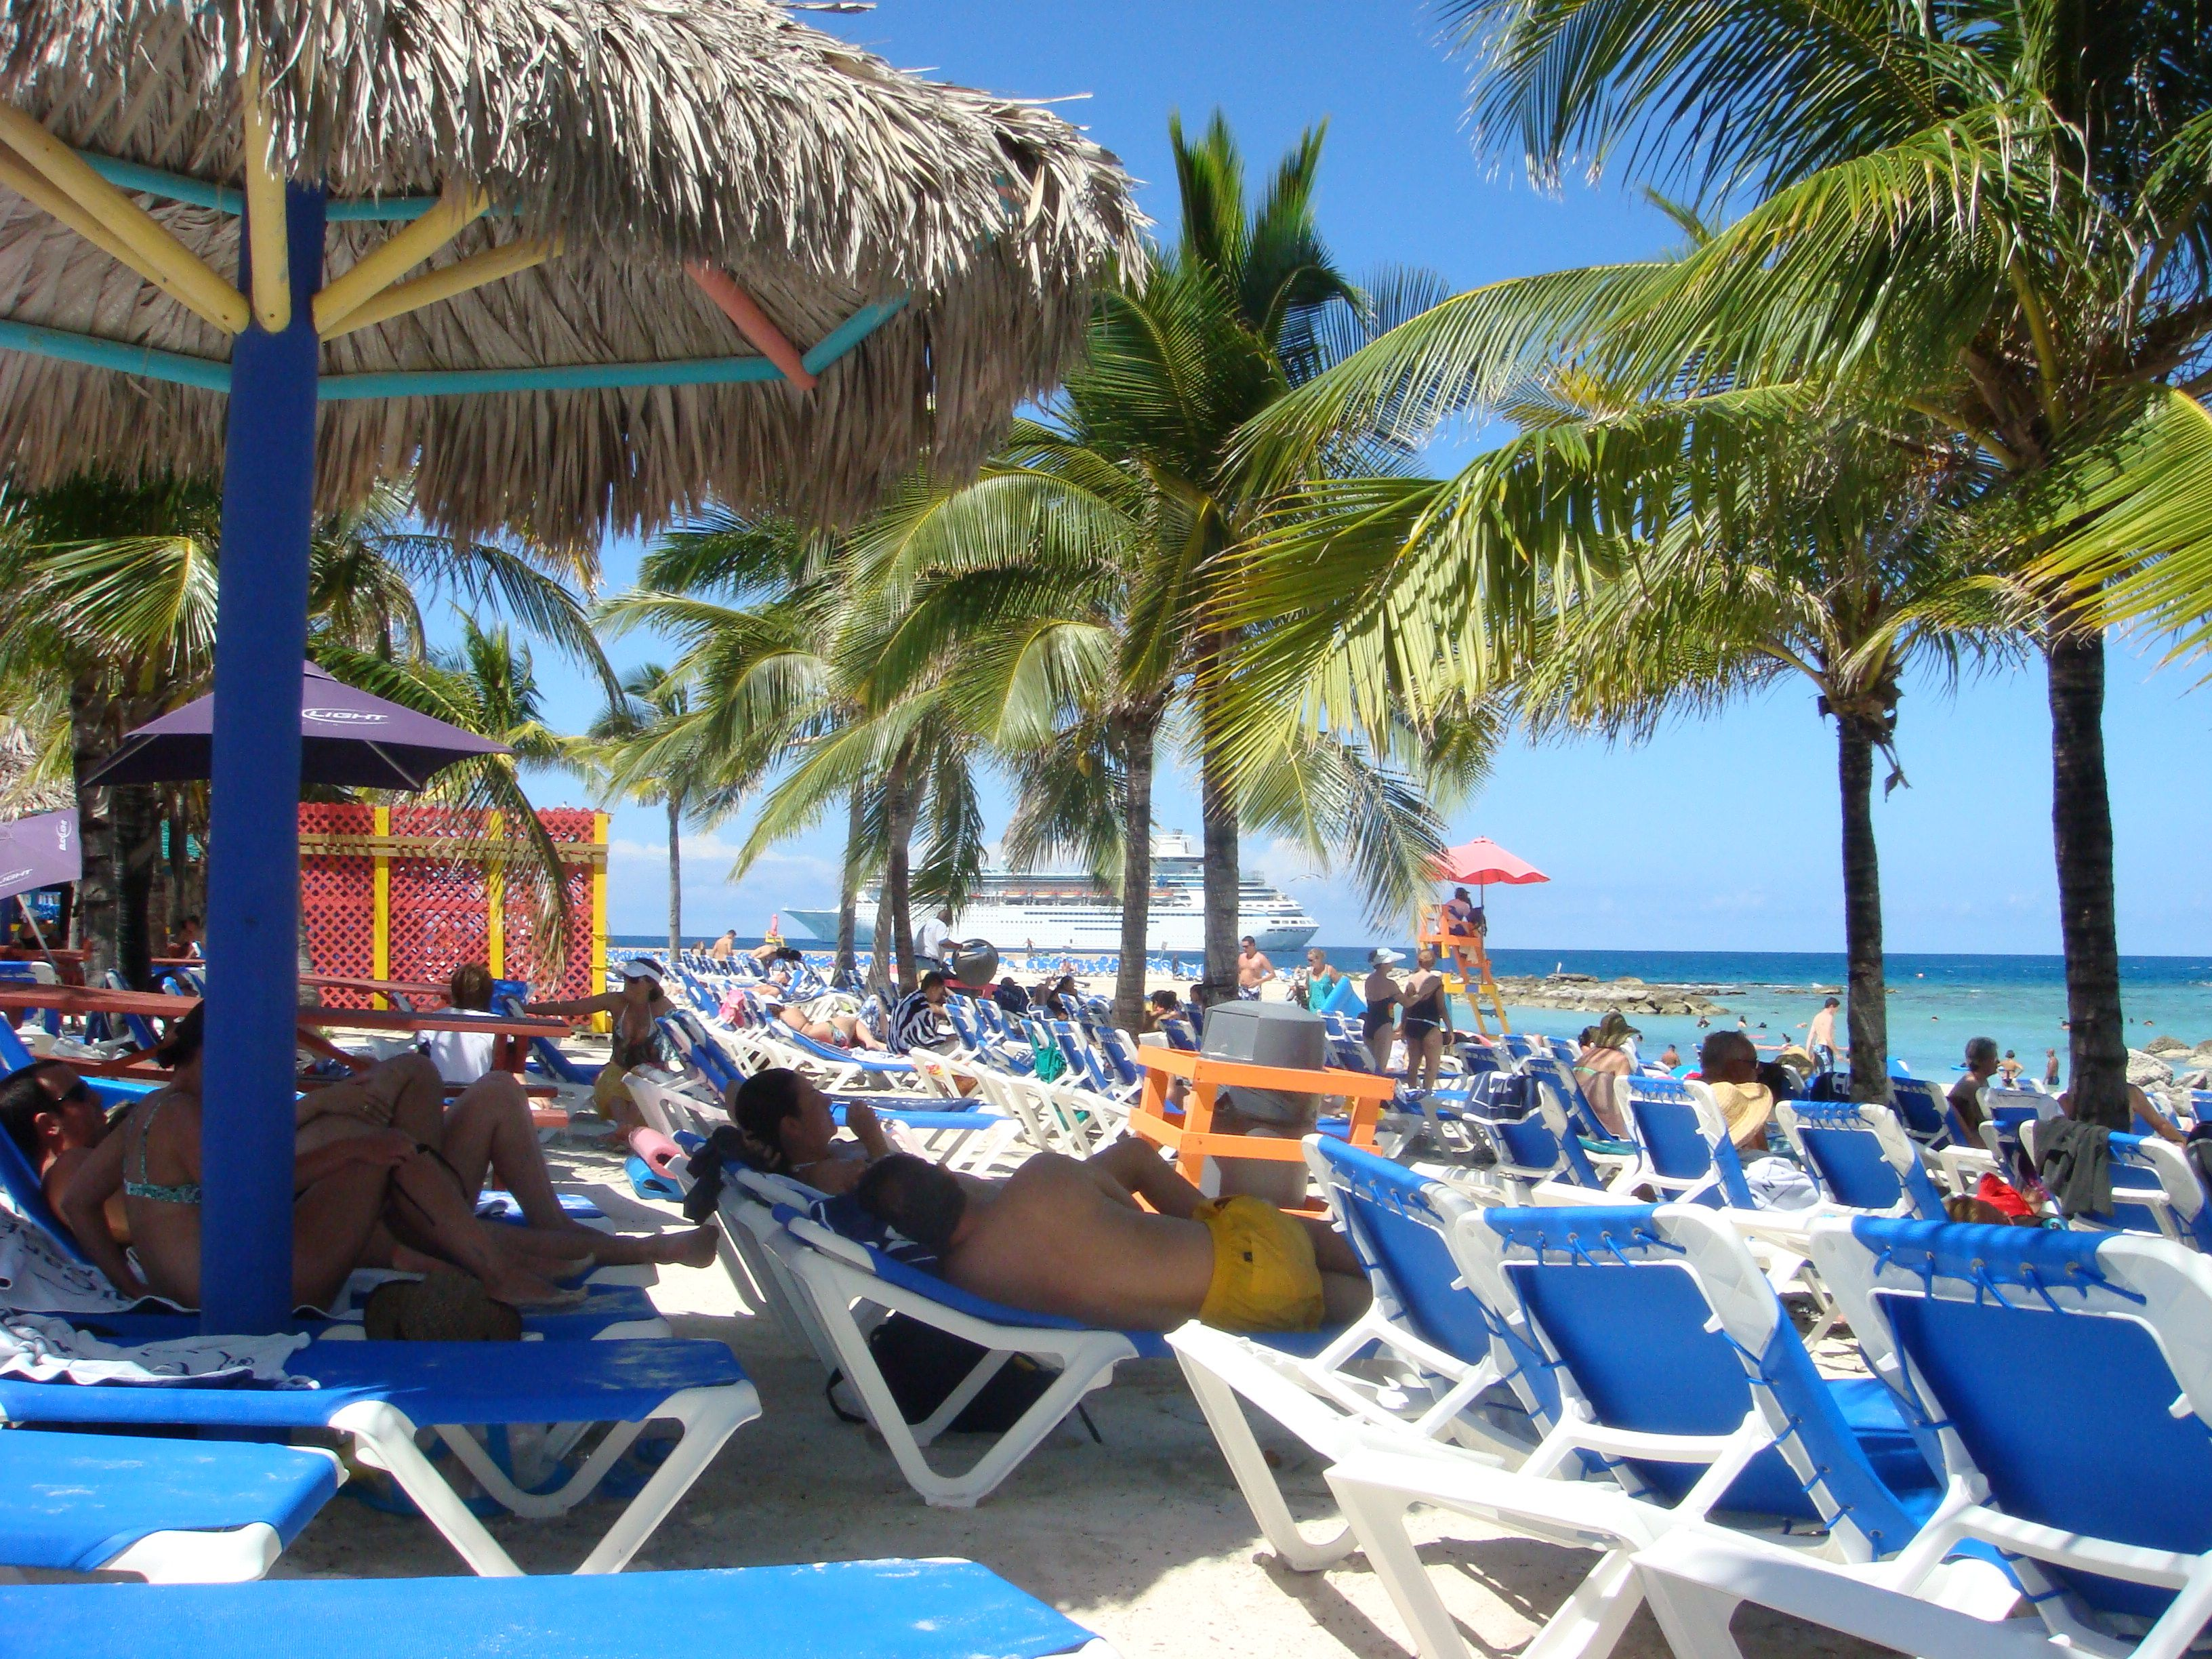 Coco Cay Bahamas Travels Pinterest Nassau Bahamas Nassau - Coco cay weather